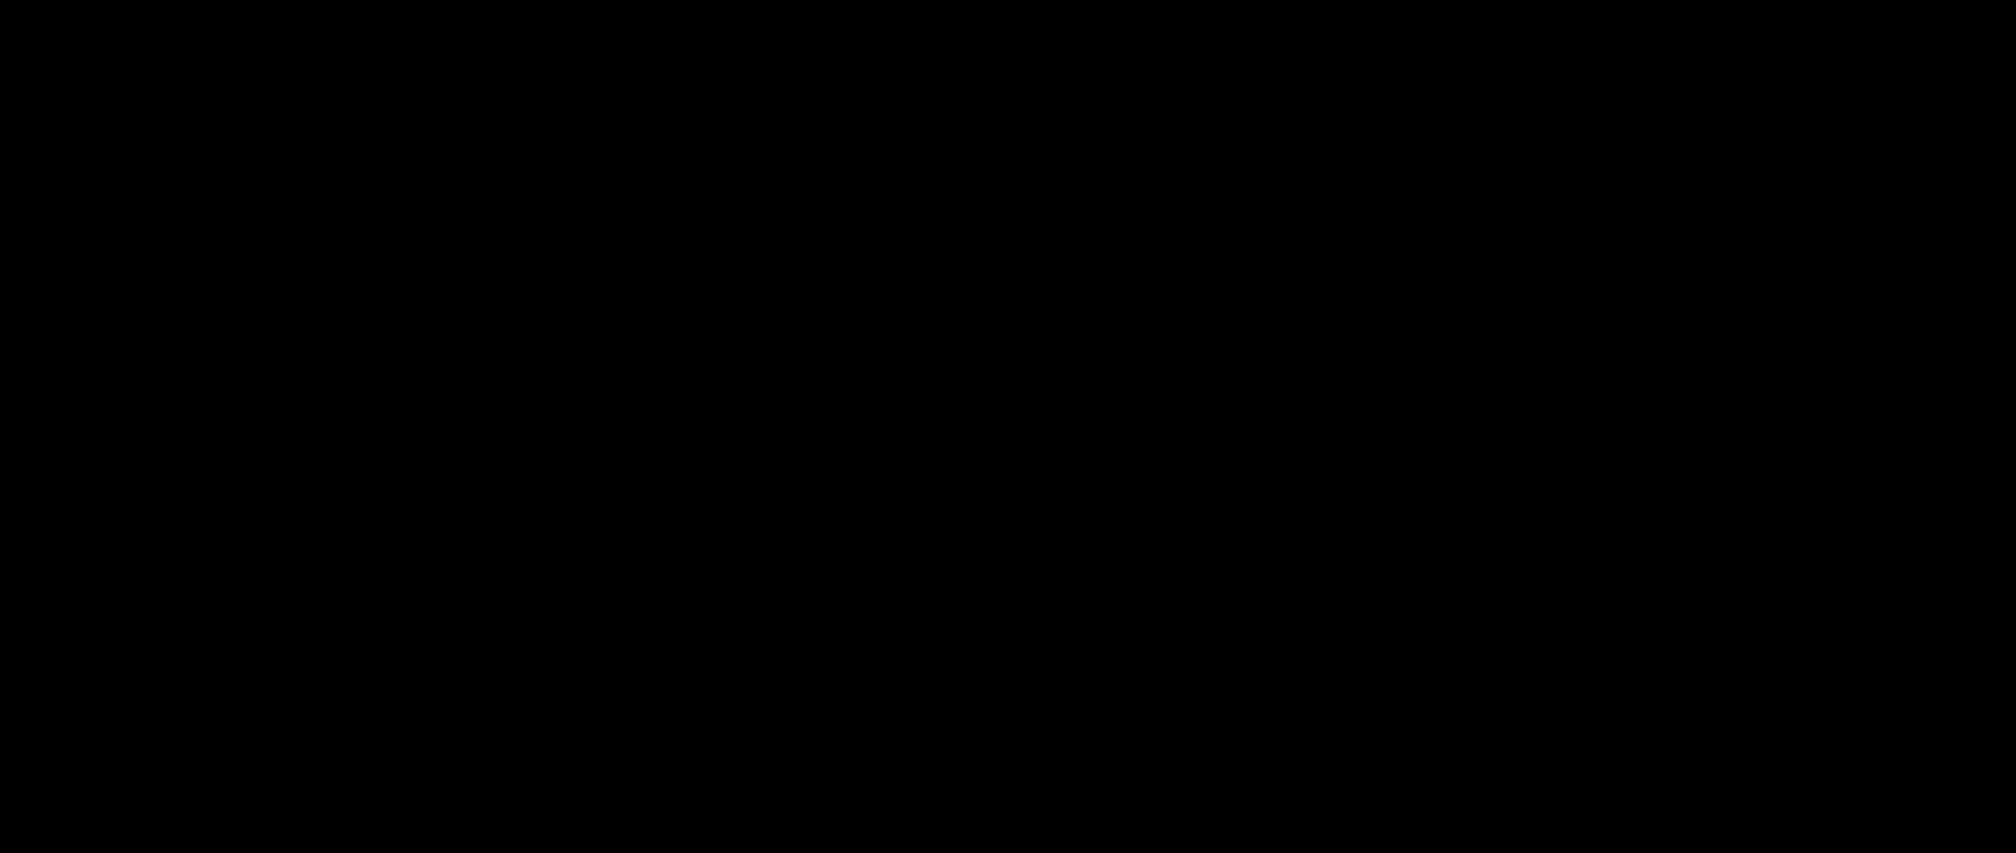 Alatrofloxacin-d<sub>4</sub> Mesylate